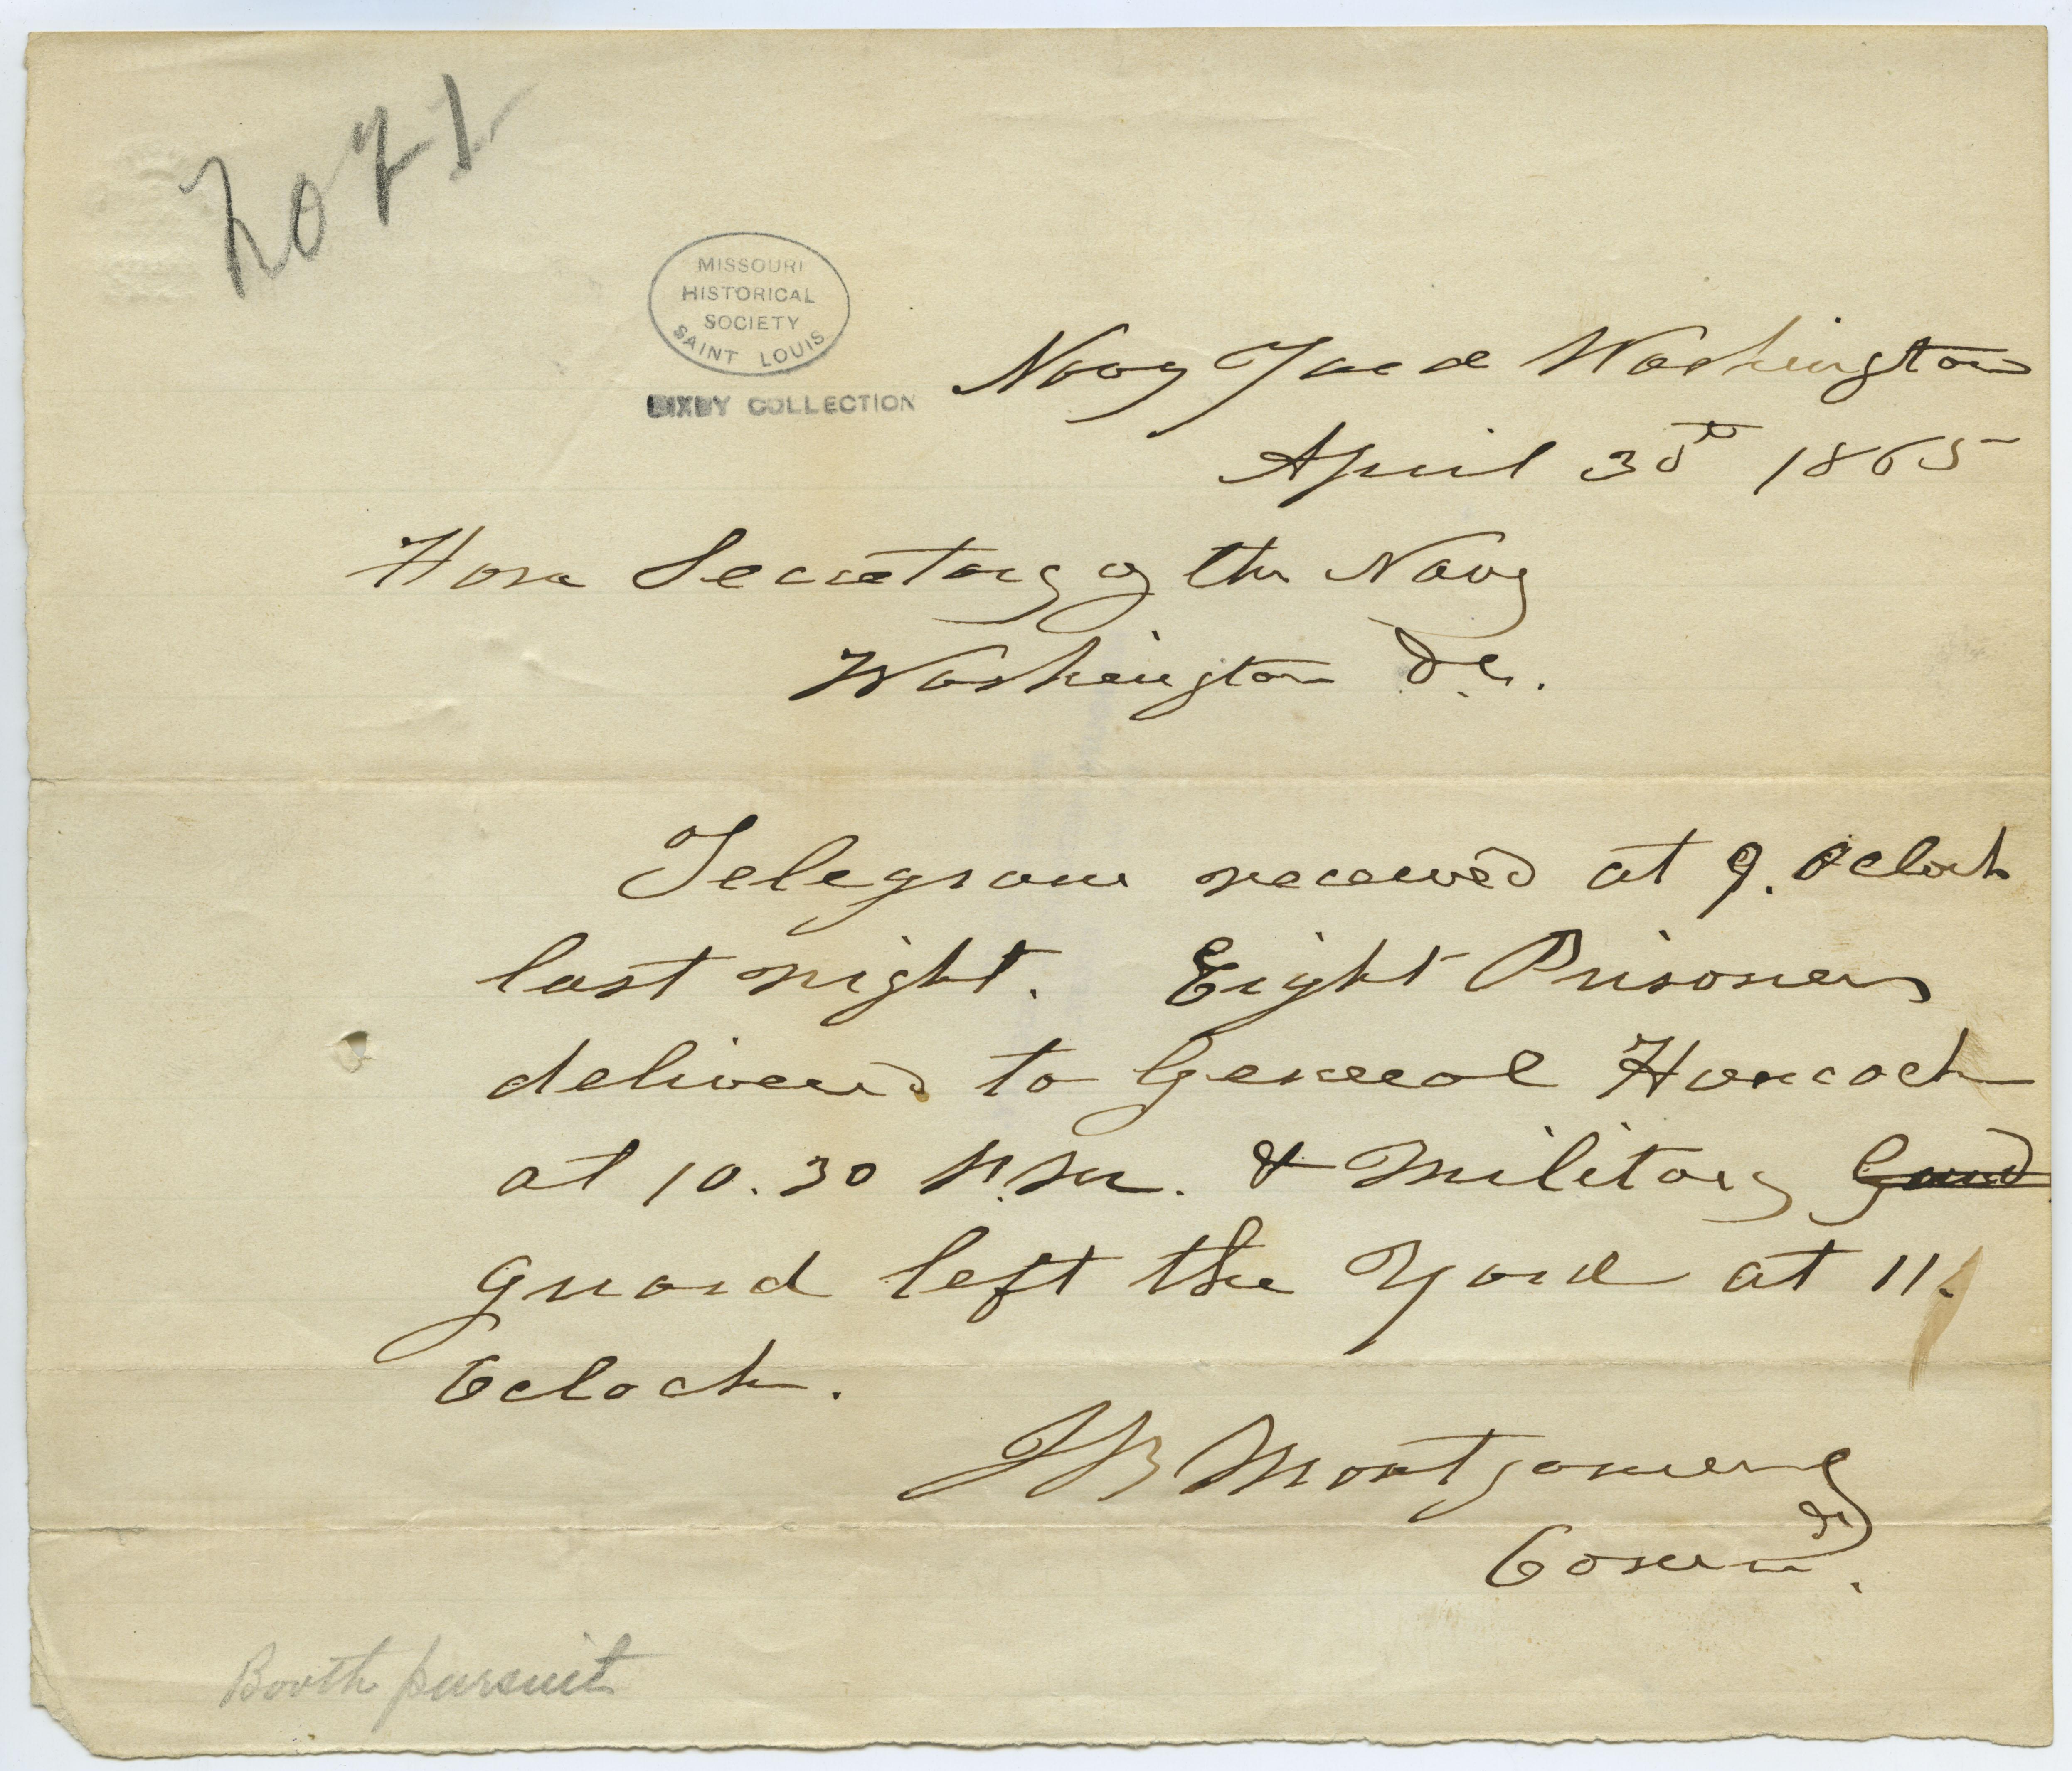 Contemporary copy of telegram of J.B. Montgomery, Navy Yard, Washington, to Hon. Secretary of the Navy [Gideon Welles], Washington, D.C., April 30, 1865